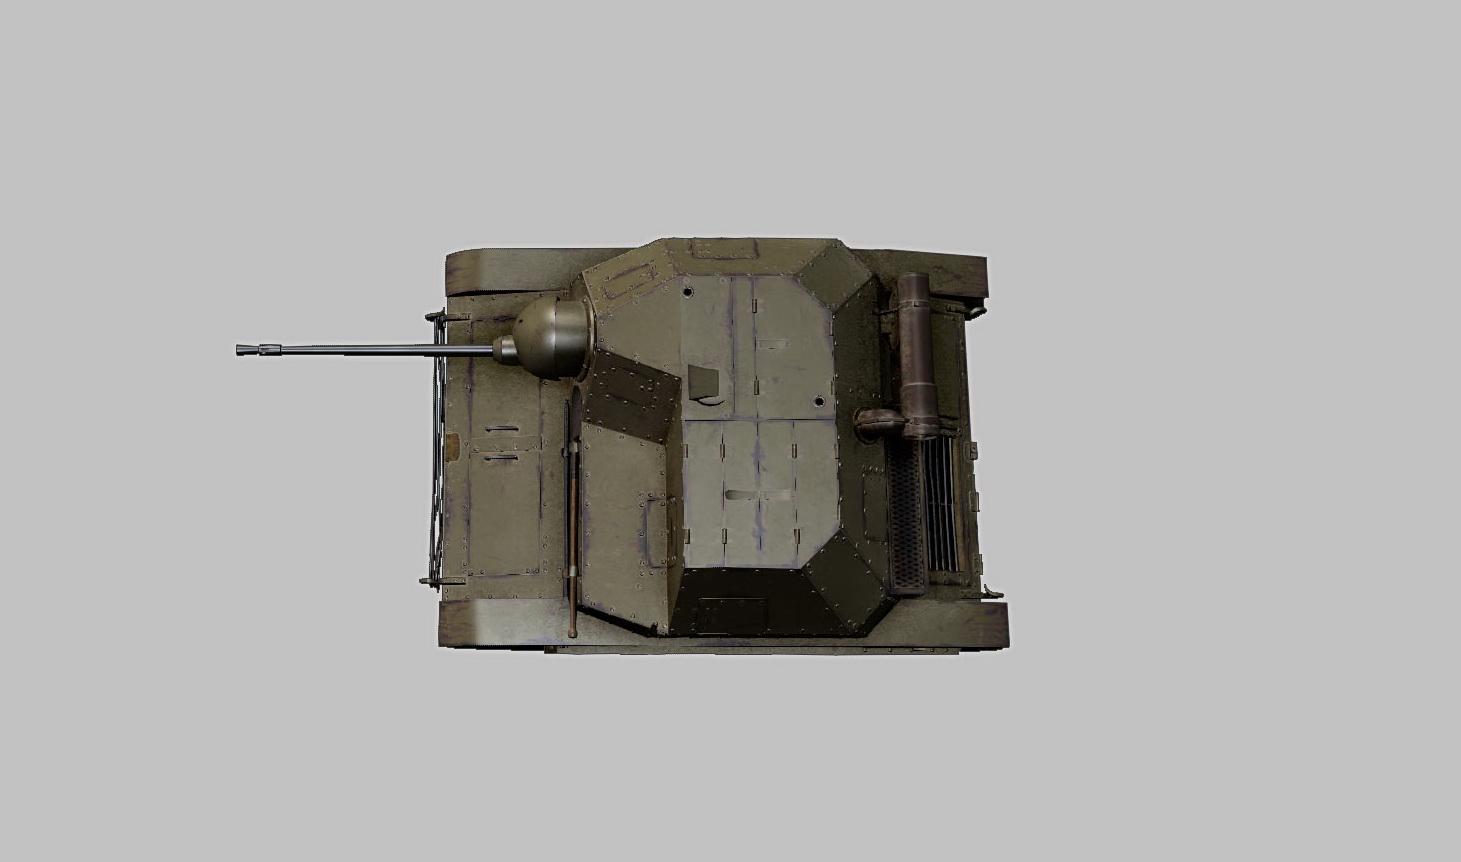 Poland-pl01 Tks 20mm 4